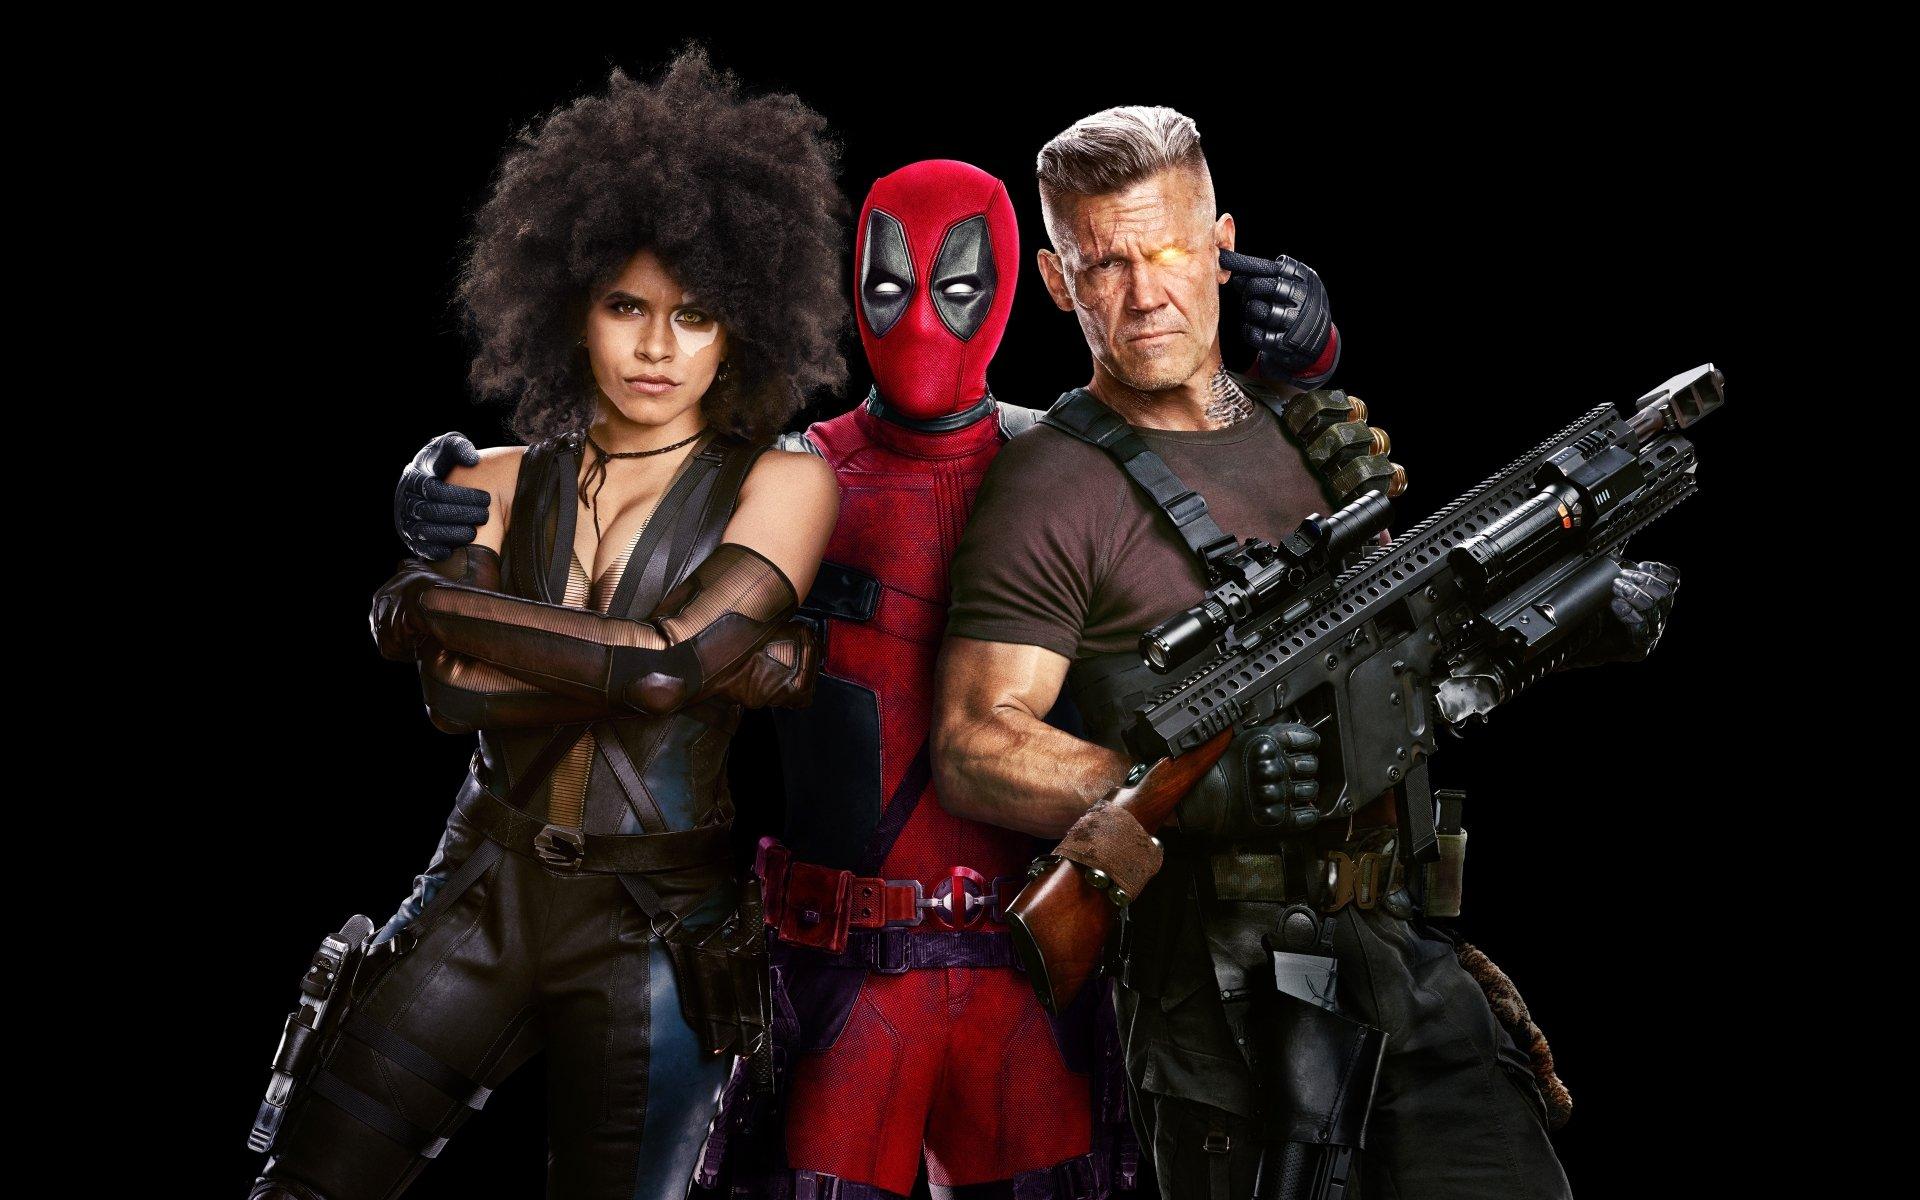 Fondos De Pantalla De Deadpool: DeadPool 2, Fondos De Pantalla De Deadpool 2, Wallpapers